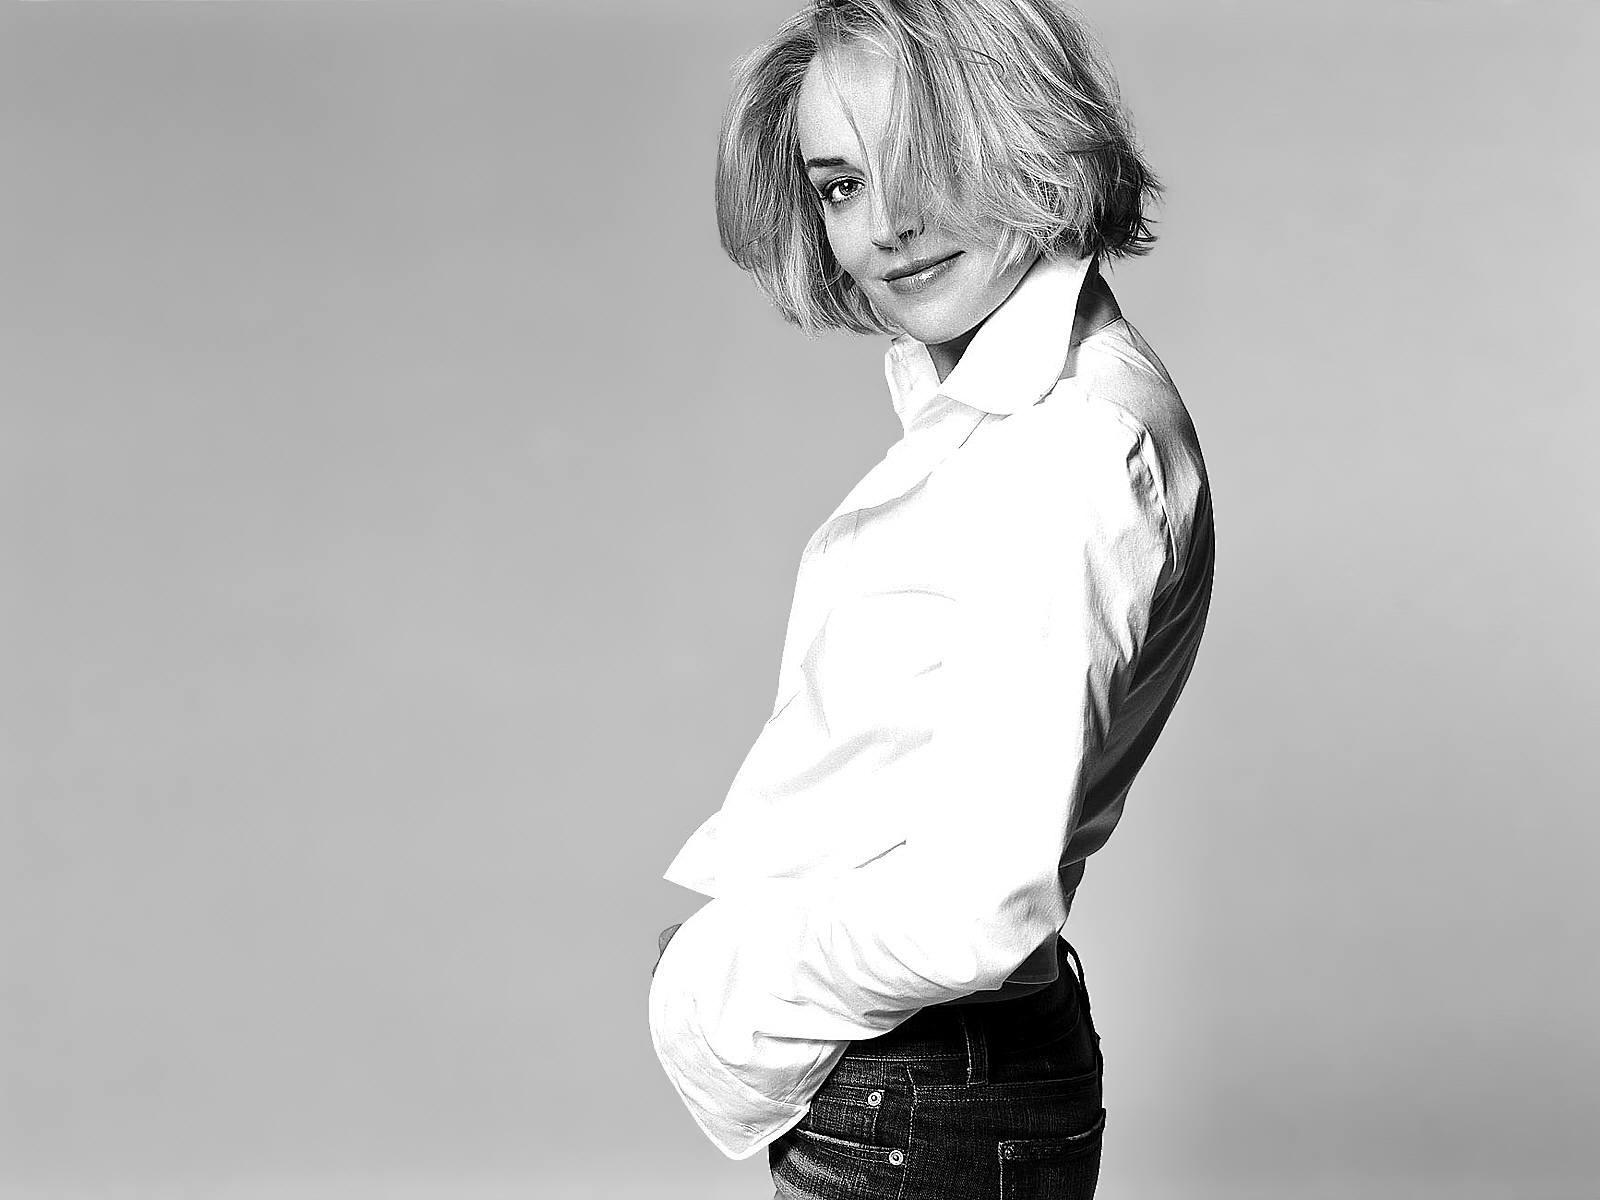 Wallpaper: una grintosa Sharon Stone